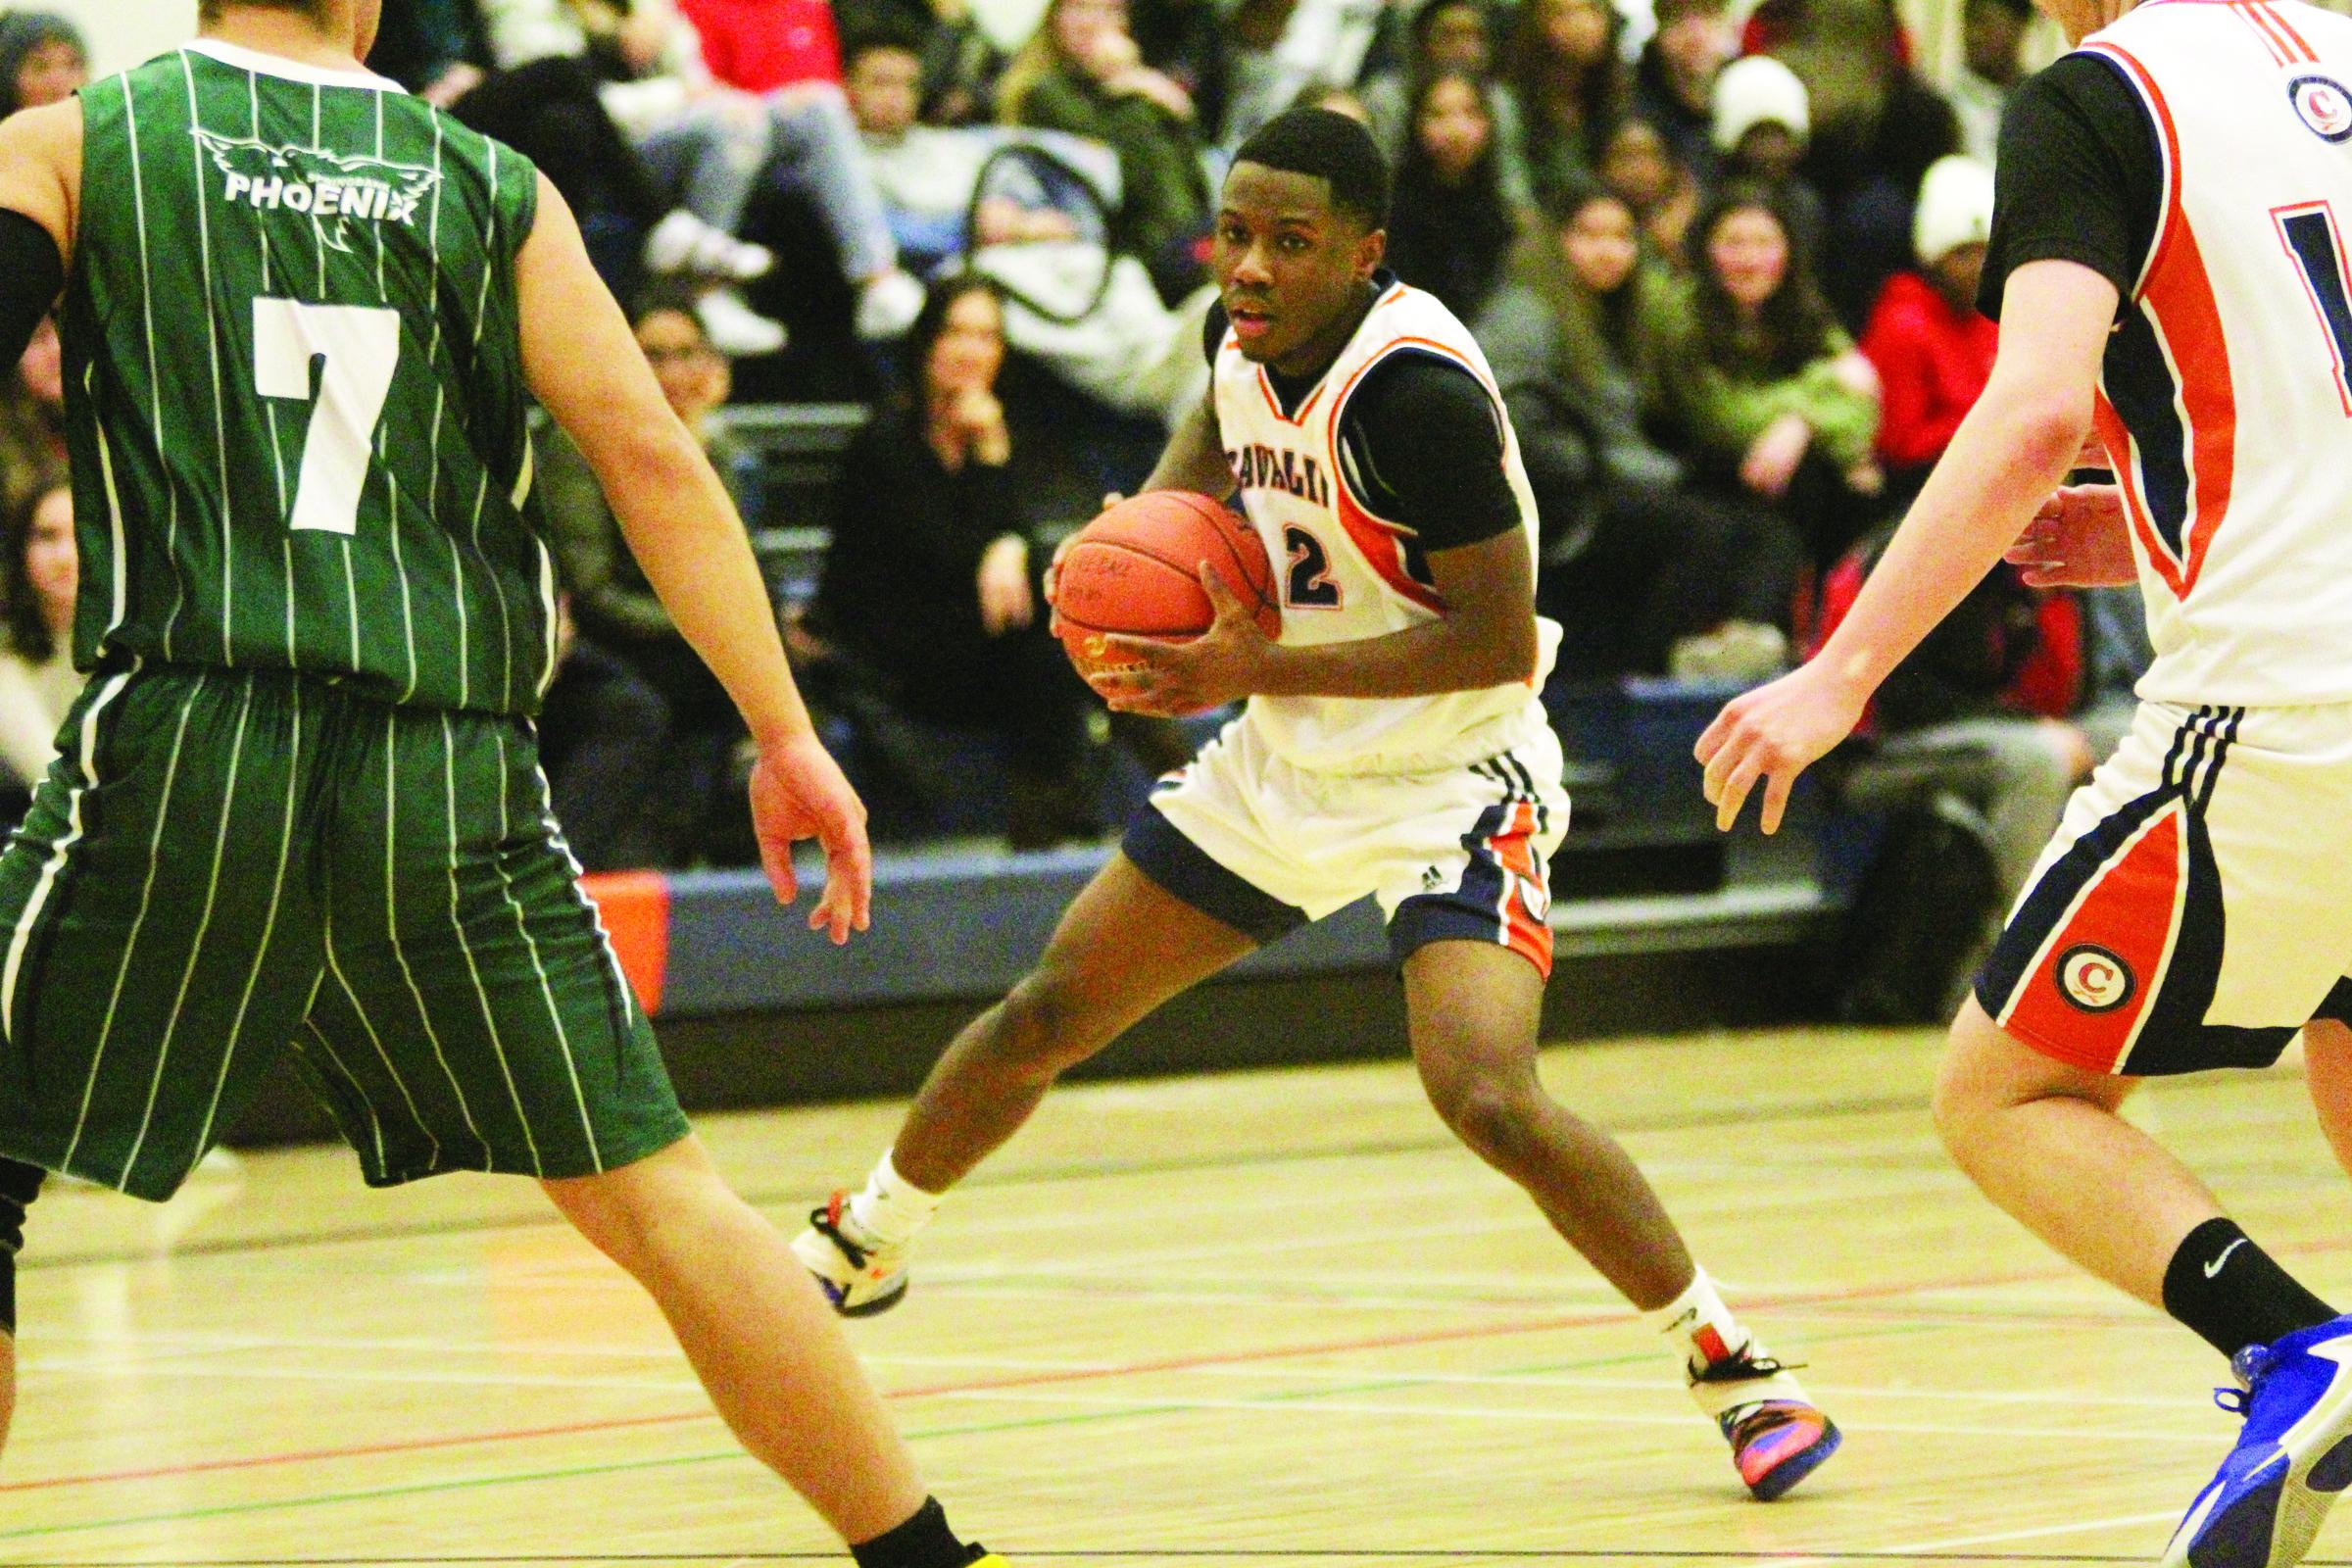 High-school basketball season resumes